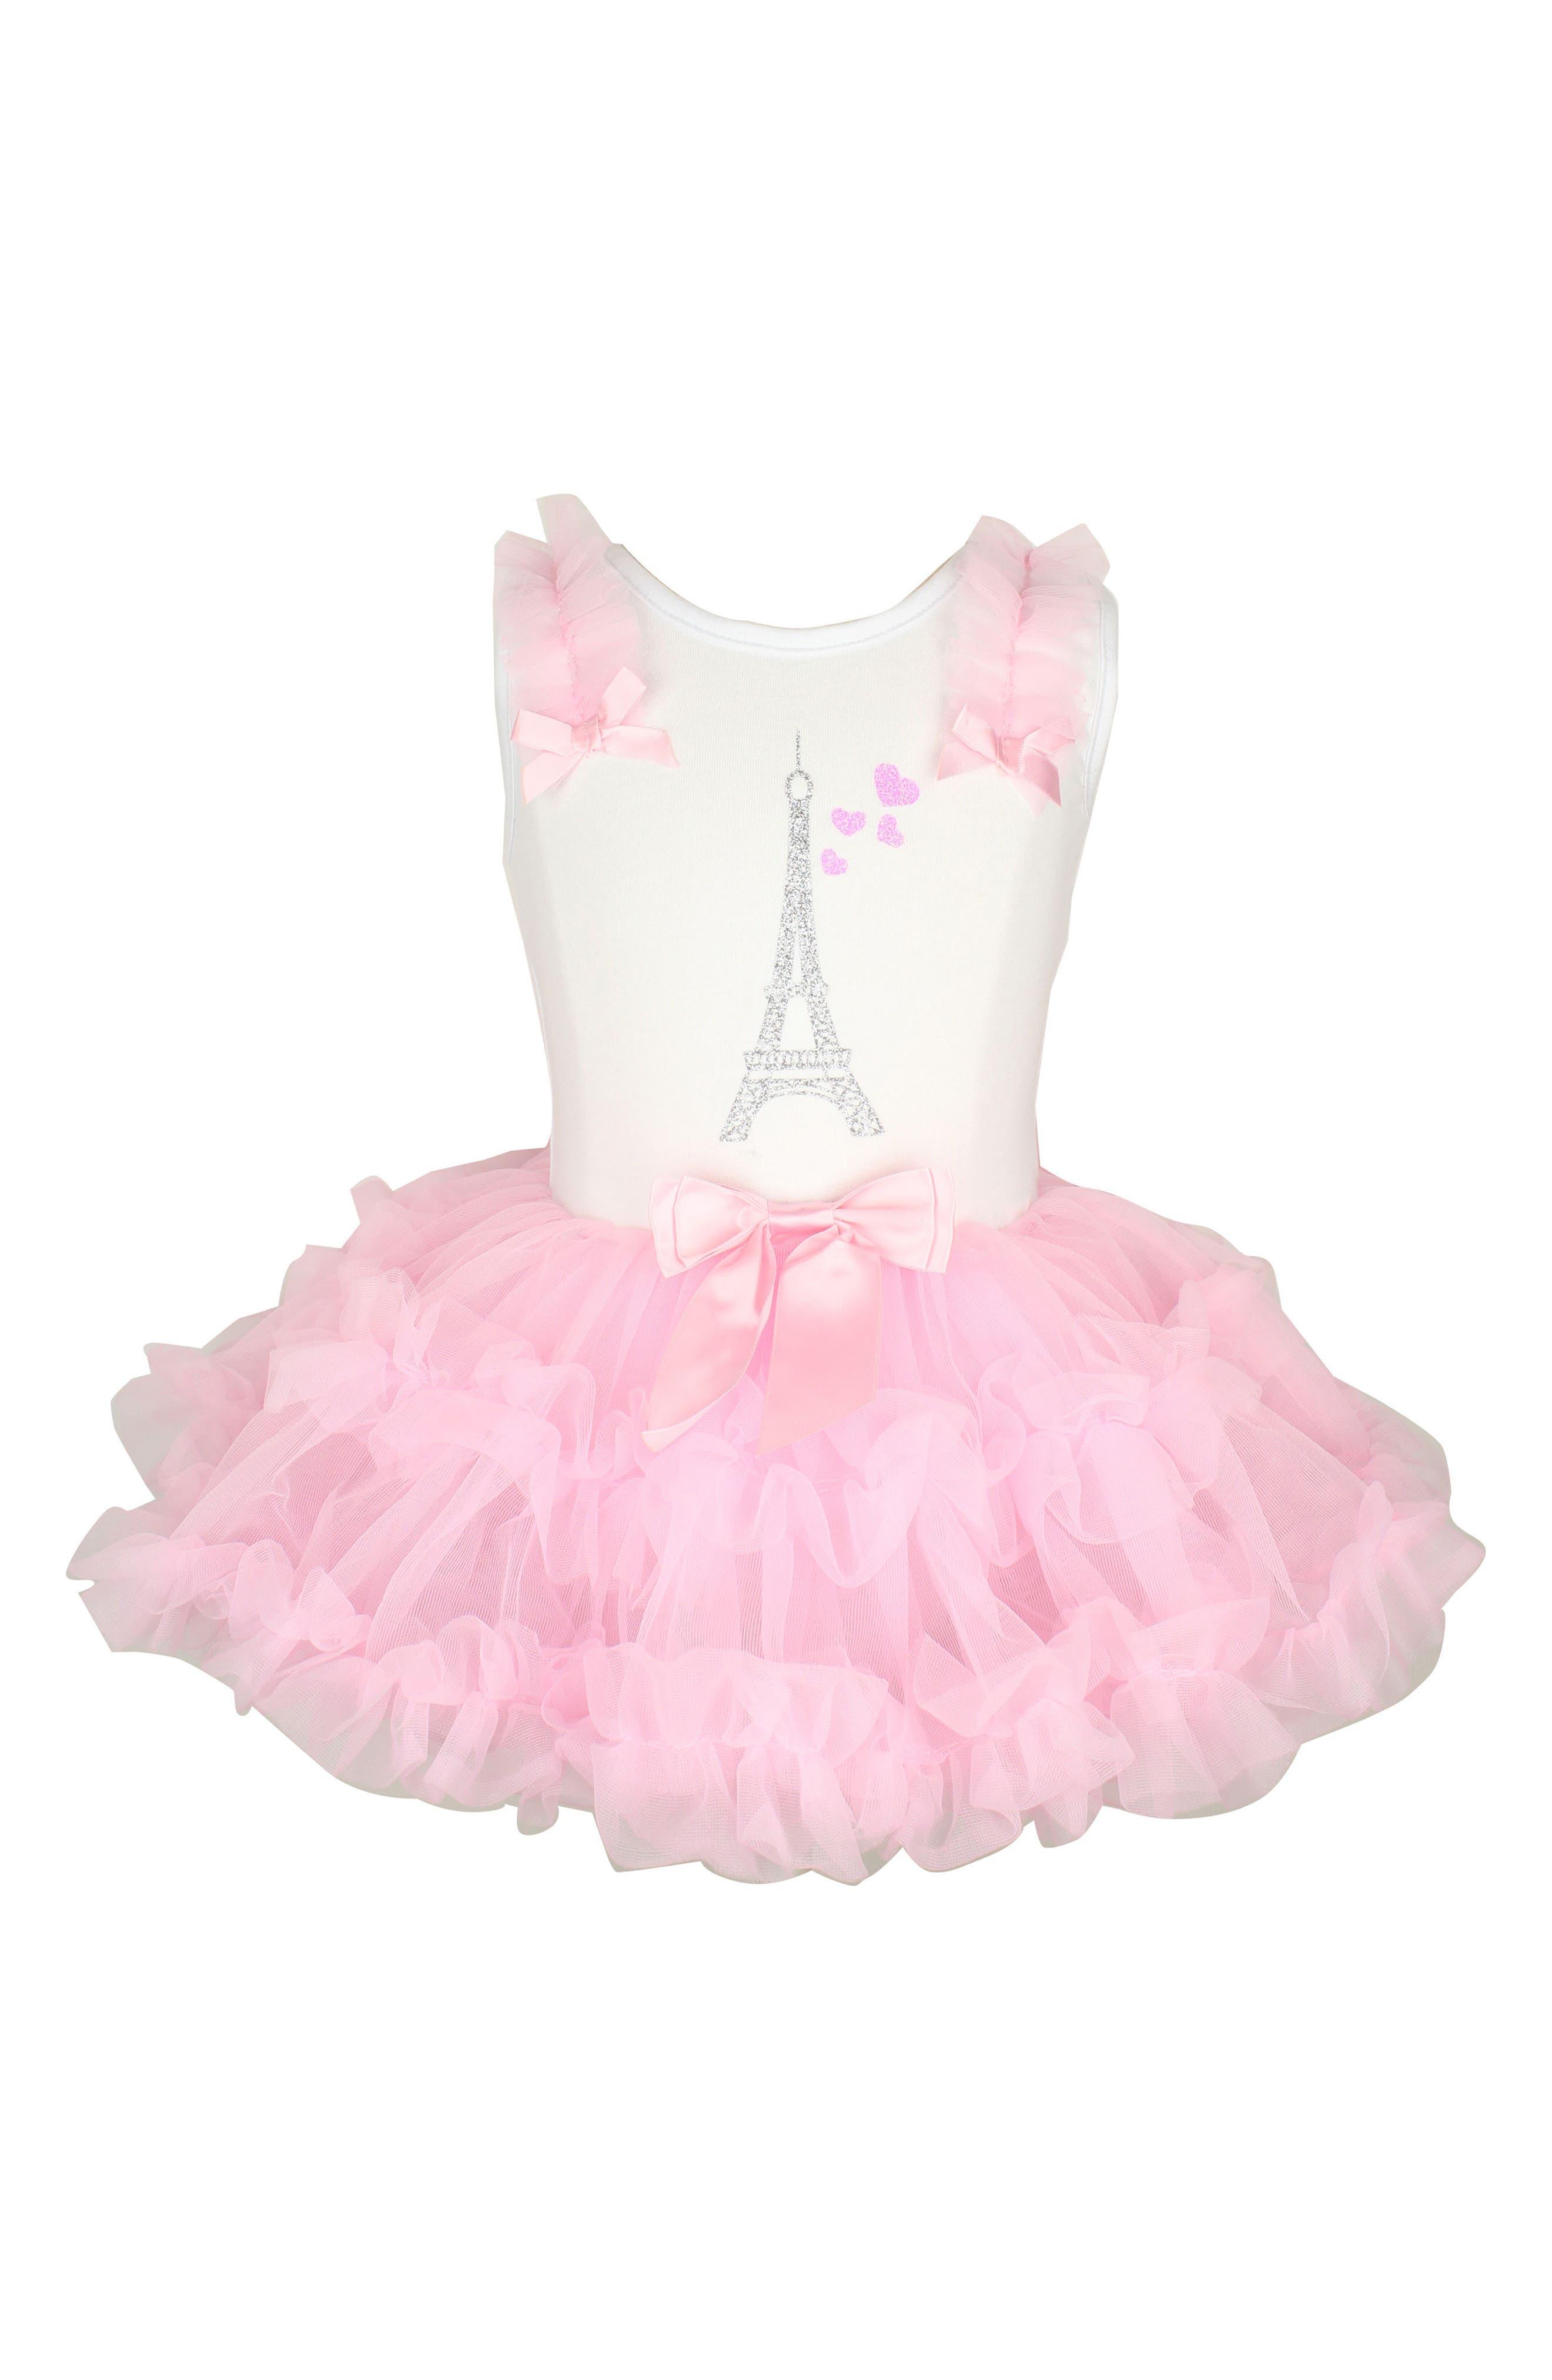 Eiffel Tower Tutu Dress,                             Main thumbnail 1, color,                             Pink